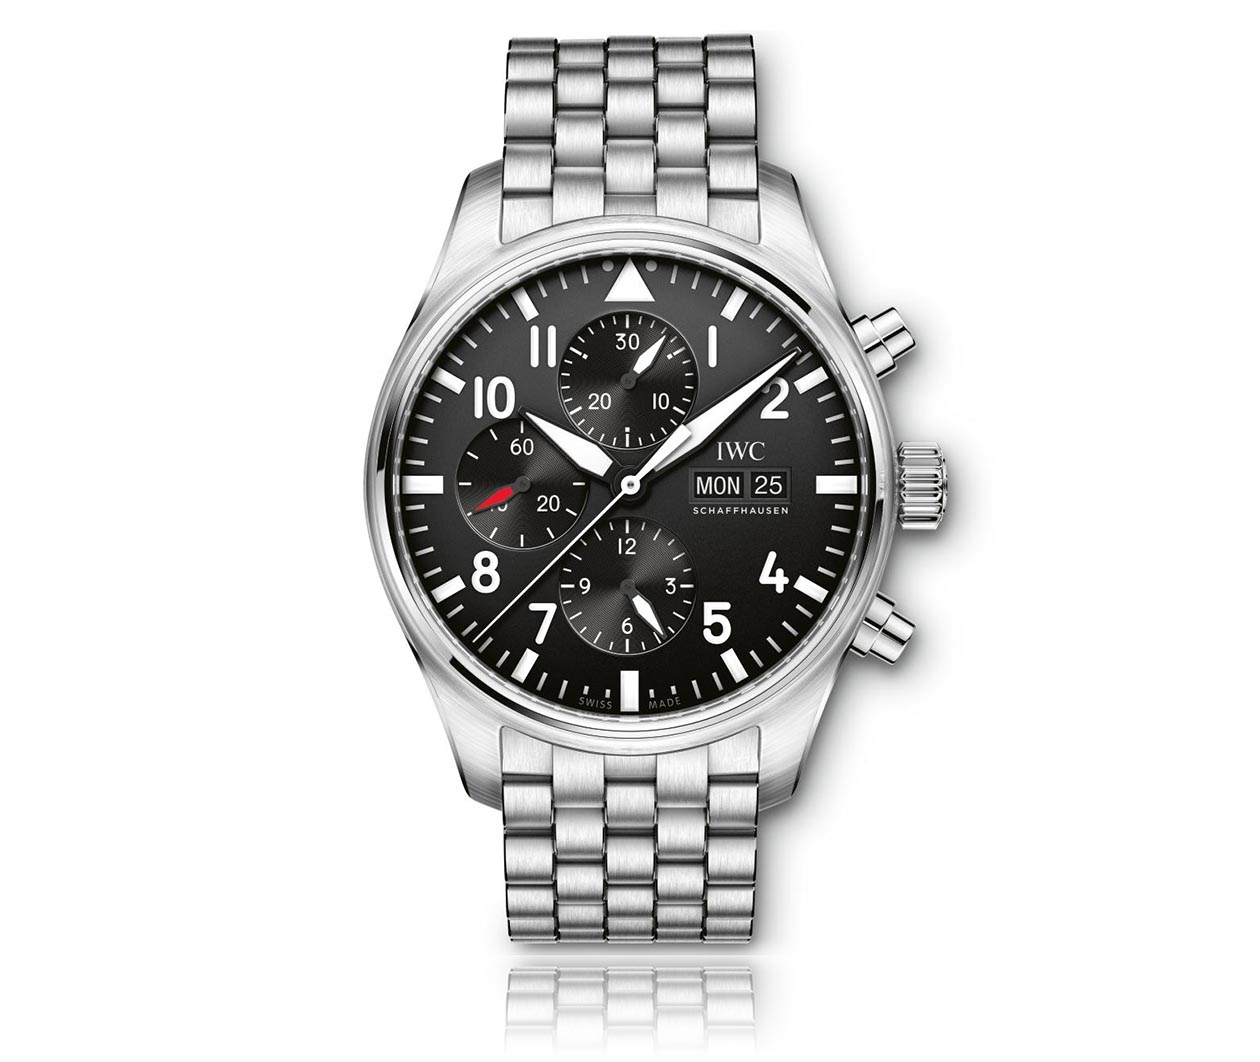 IWC PilotsWatch Chronograph IW377710 Flatlay FINAL